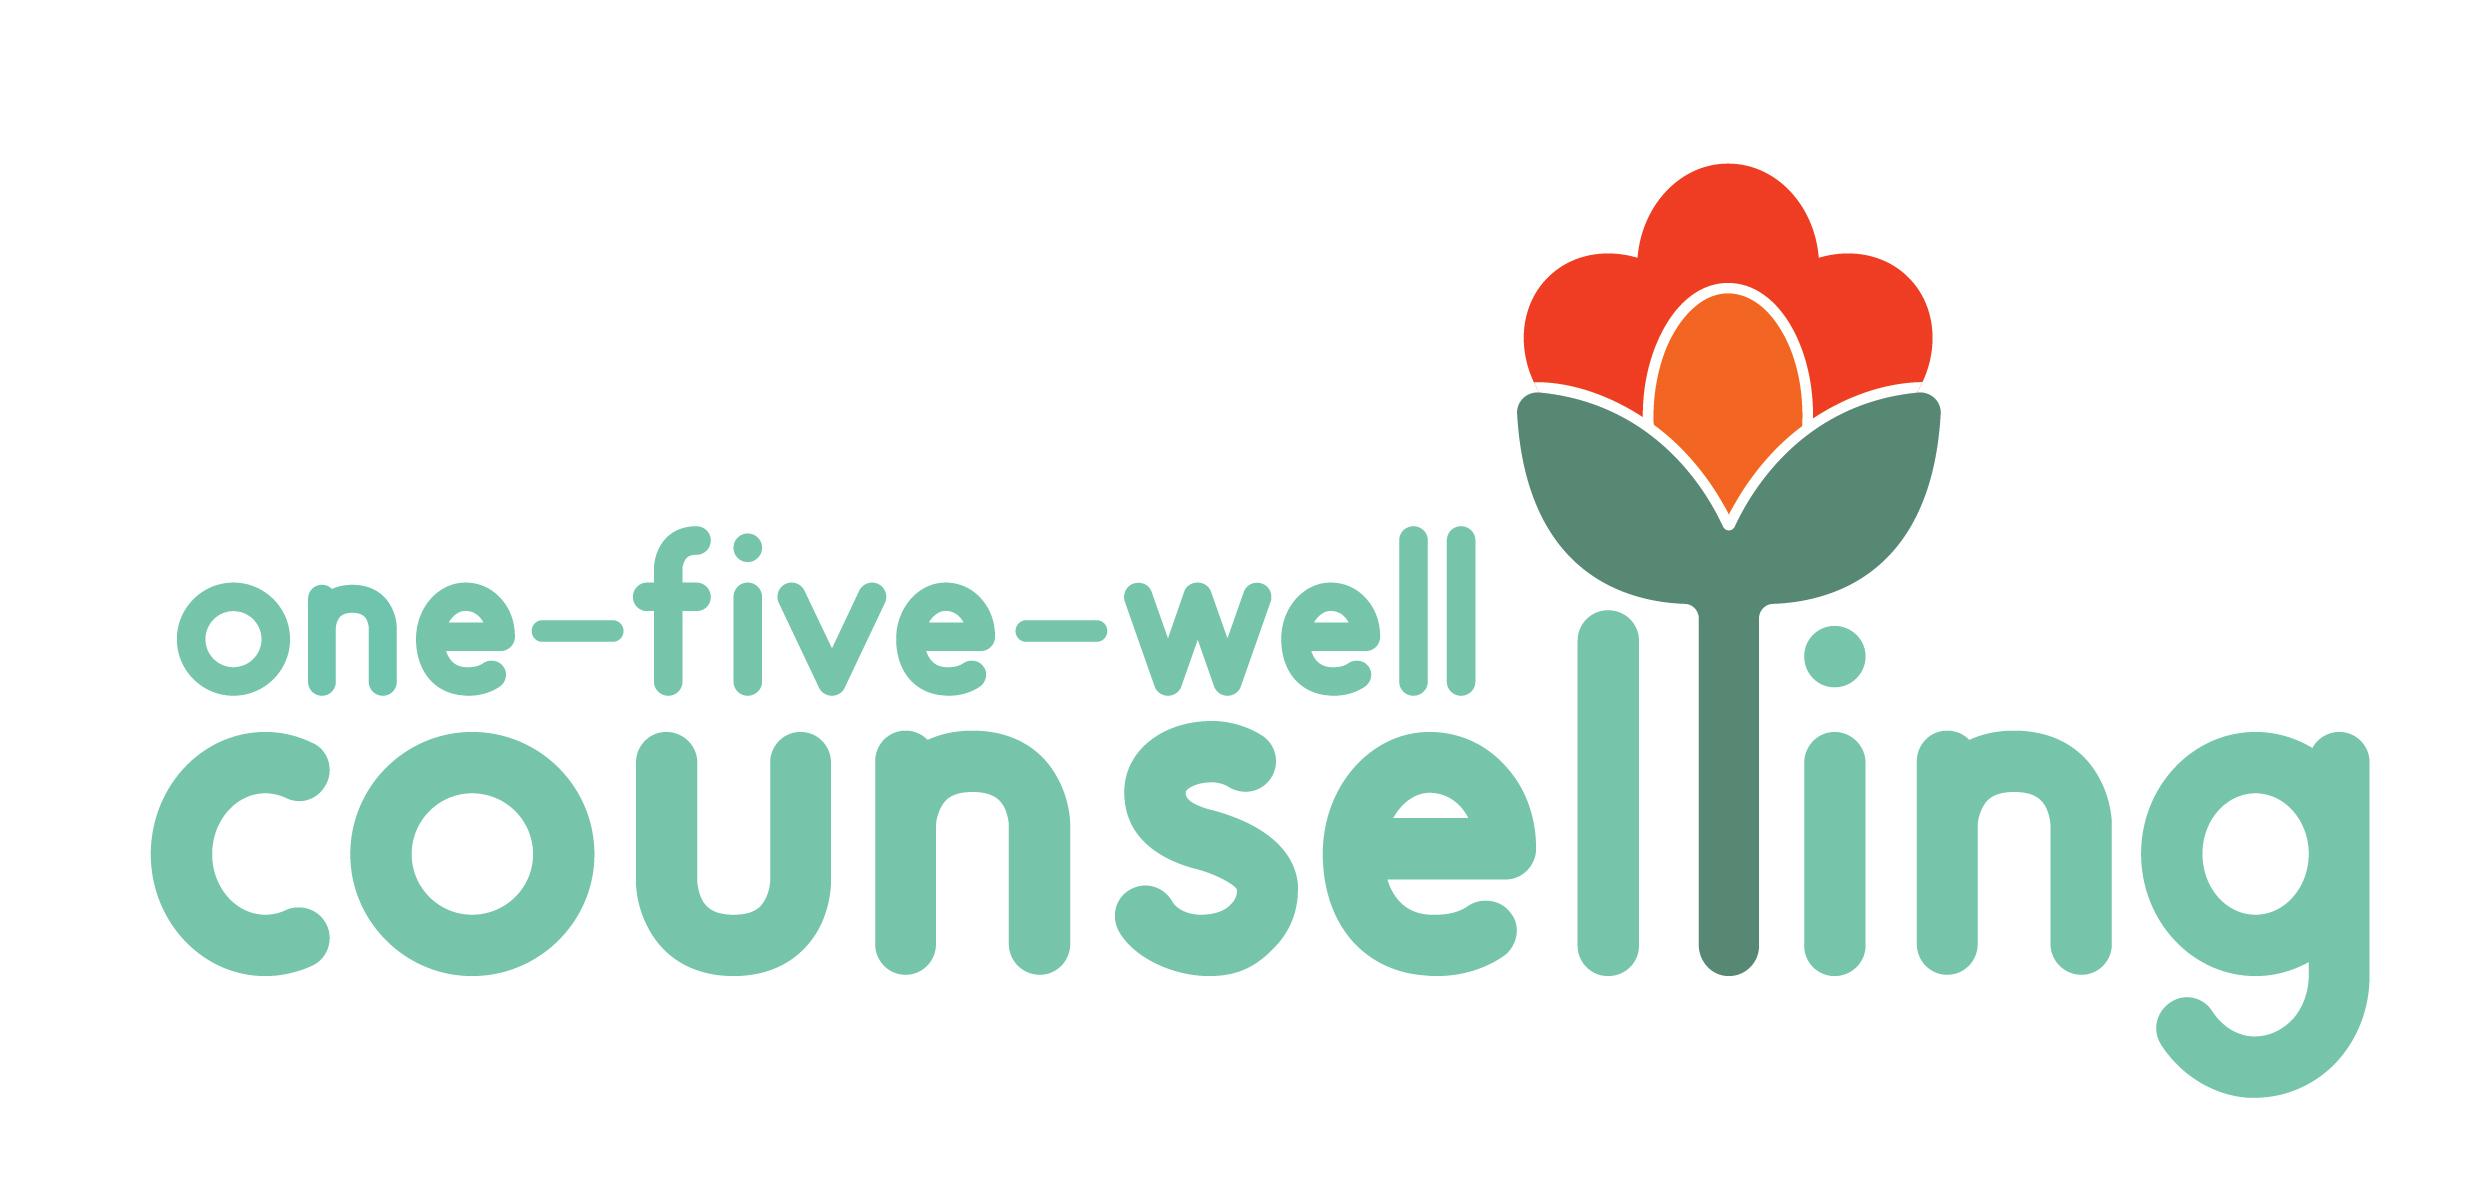 Counselling Service logos-03.jpg